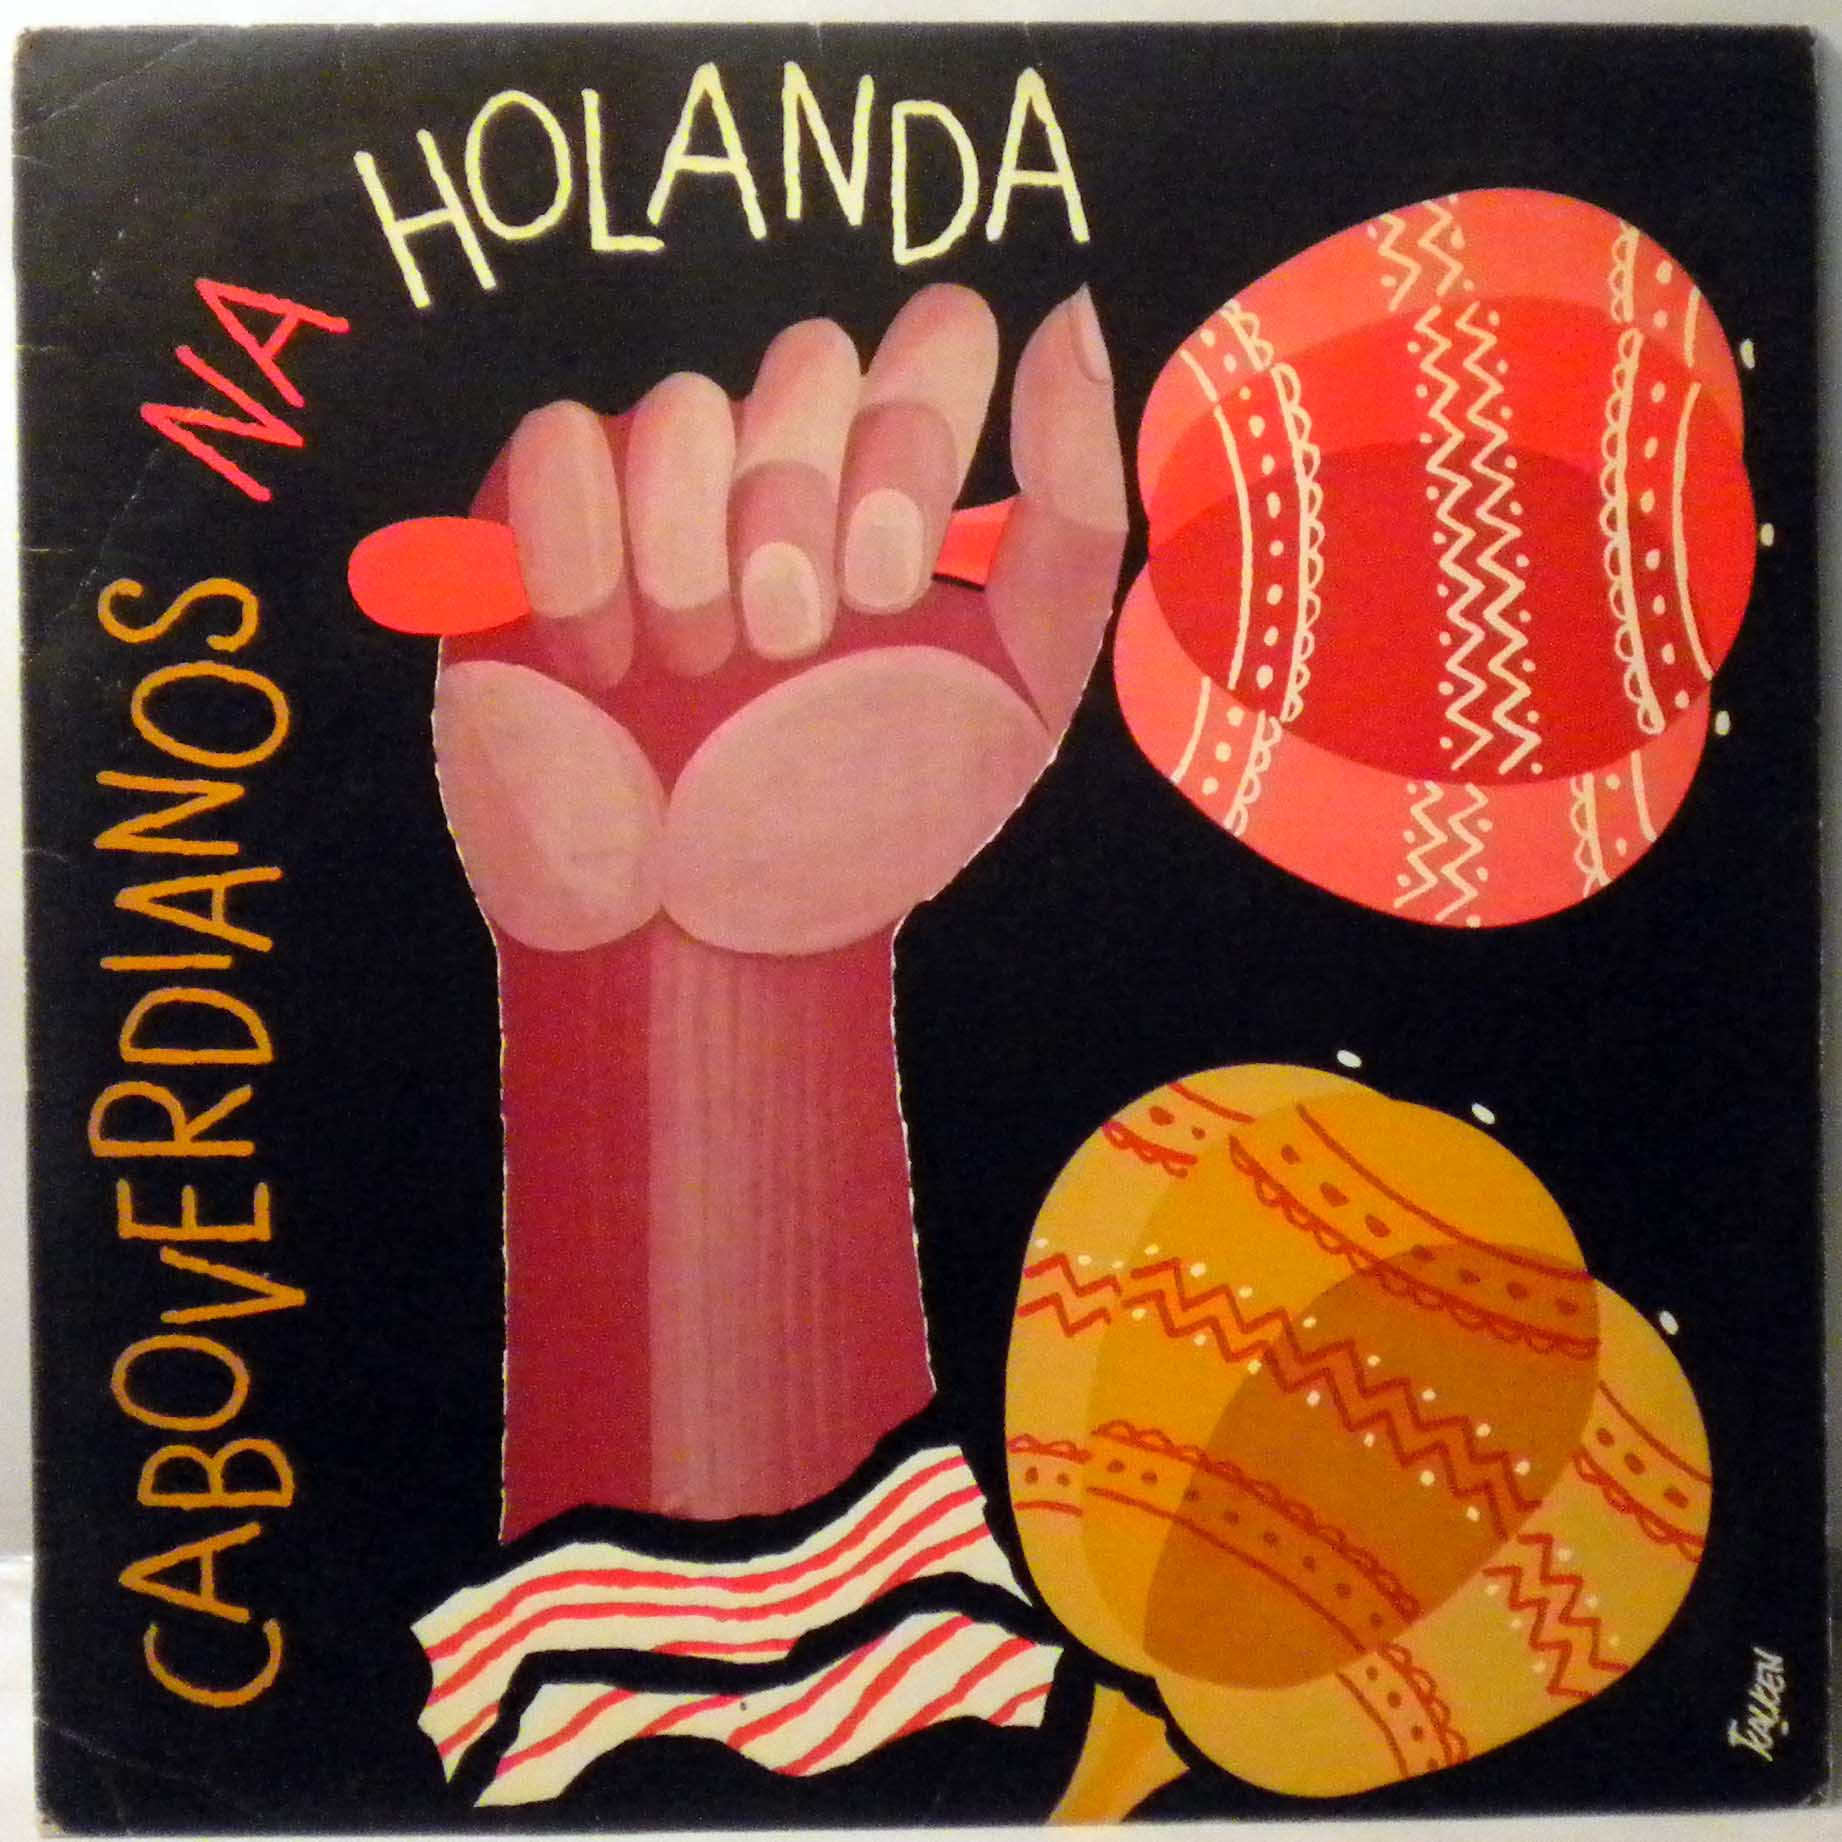 VARIOUS - Caboverdianos na Holanda - LP